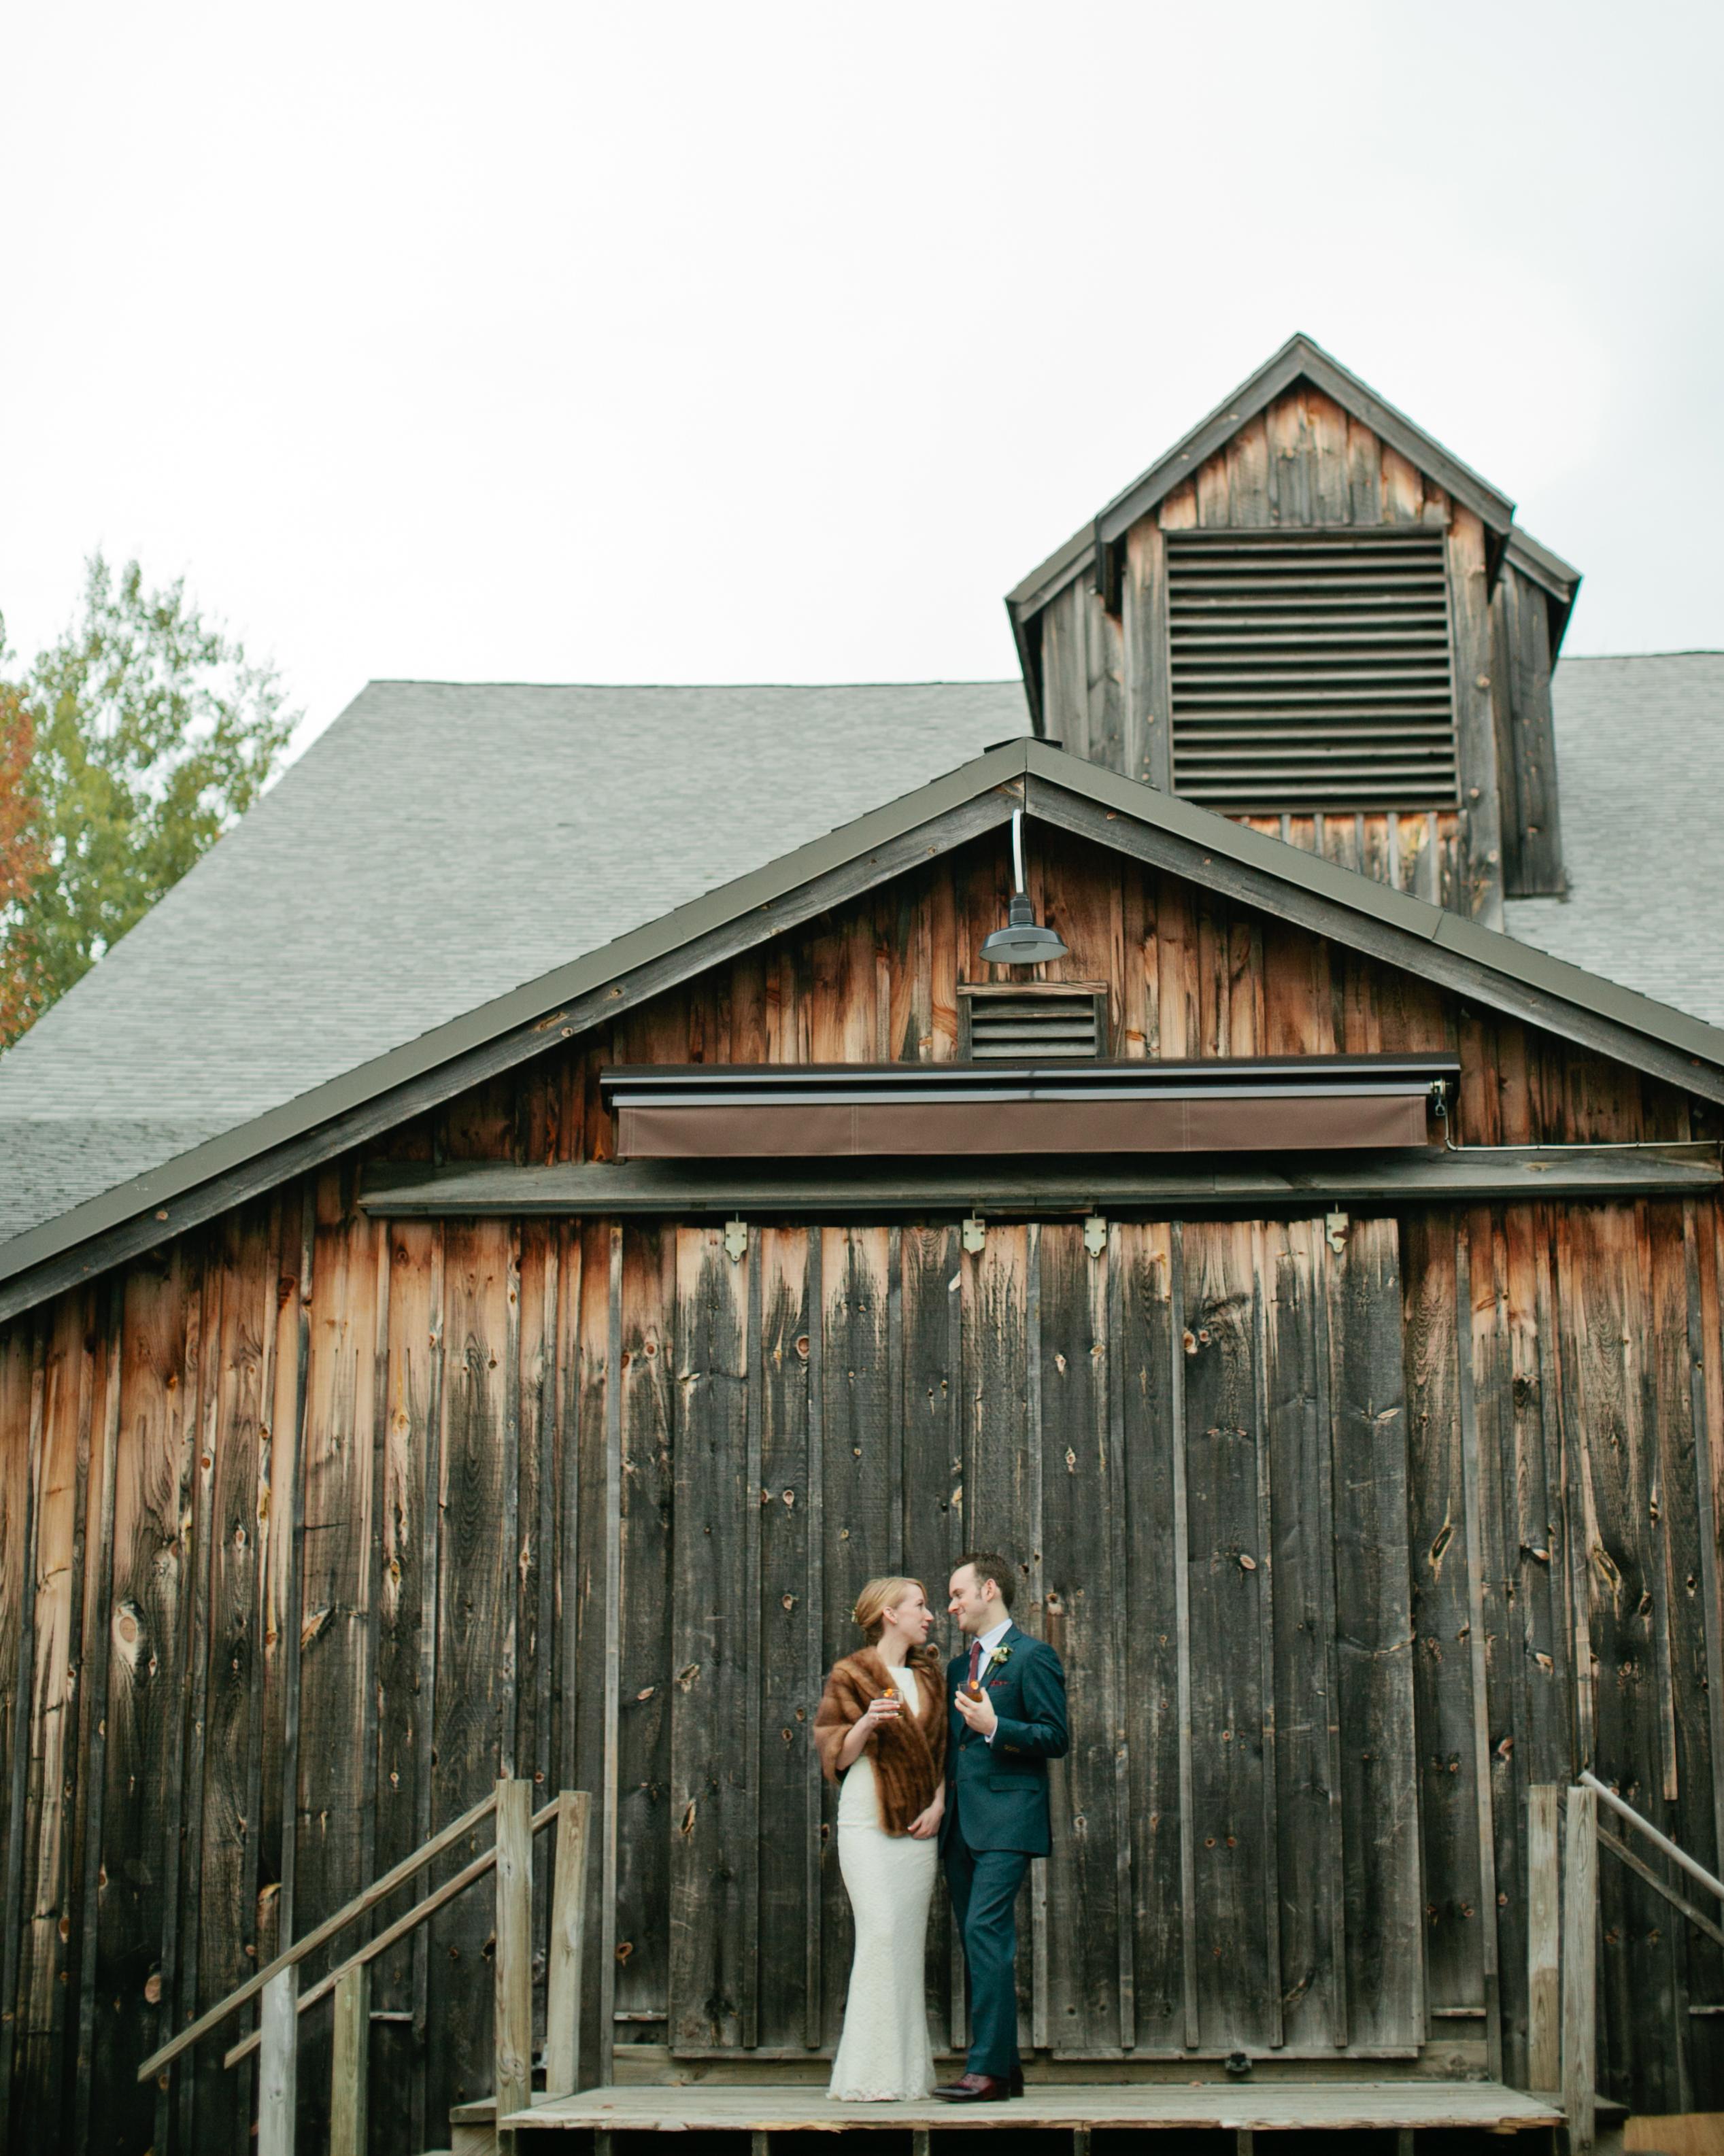 jess-steve-wedding-couple-146-s112362-1115.jpg